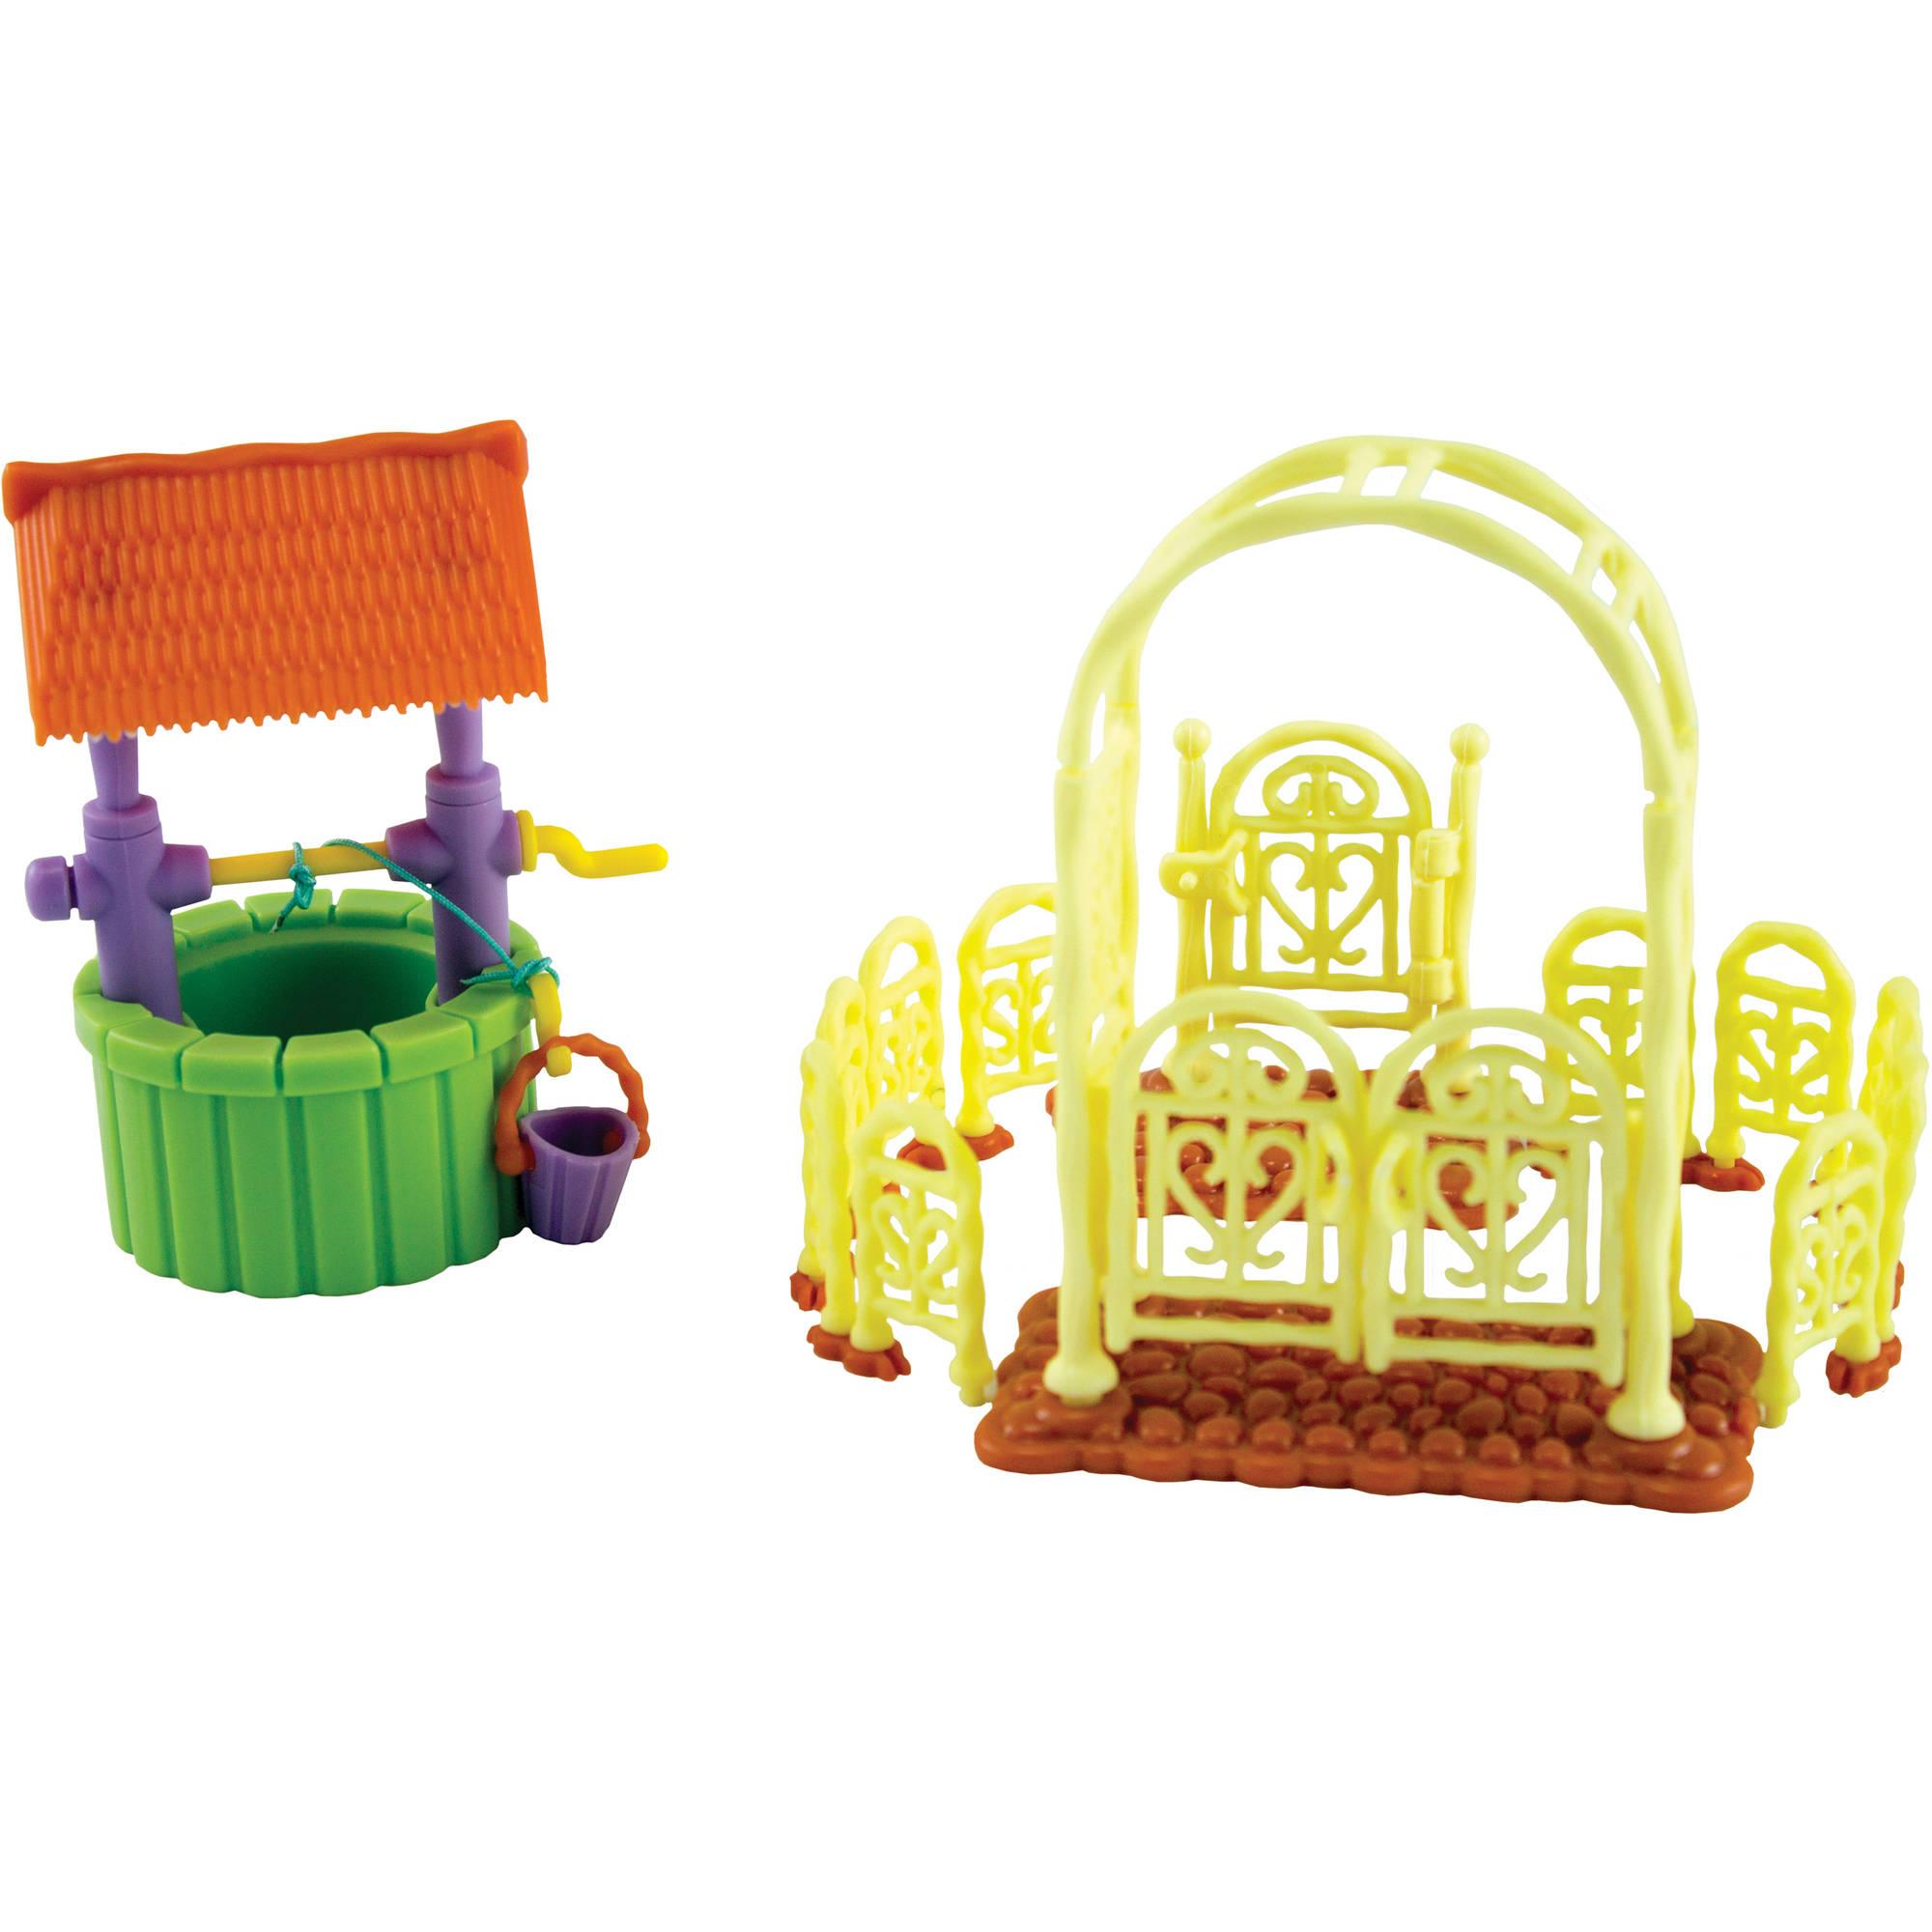 My Fairy Garden Accessory Pack